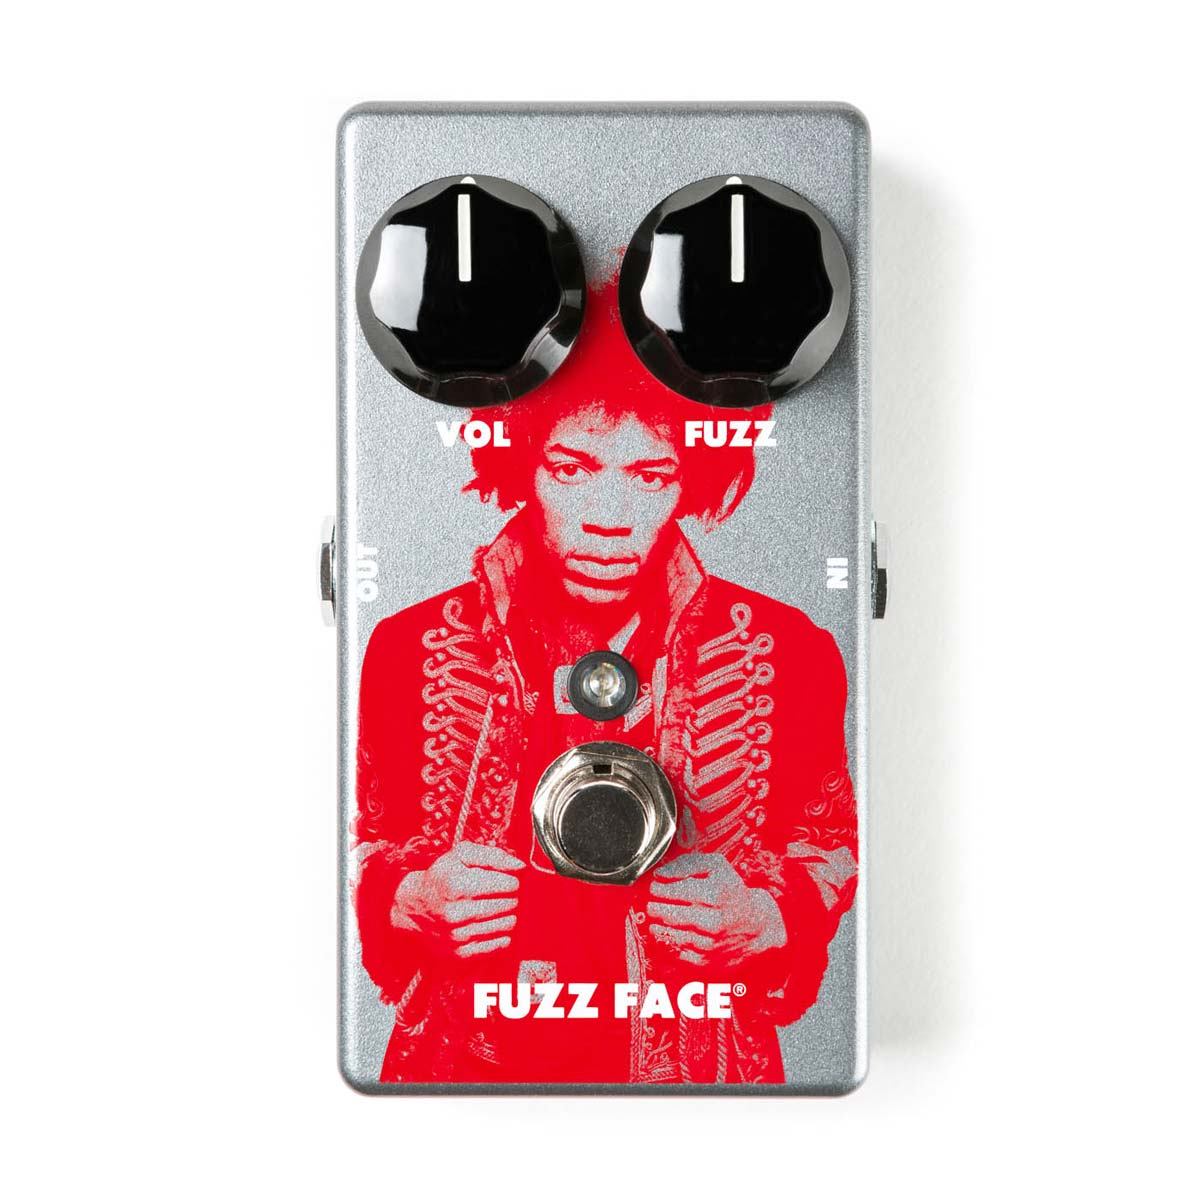 Dunlop Jimi Hendrix Fuzz Face LTD guitar-effekt-pedal